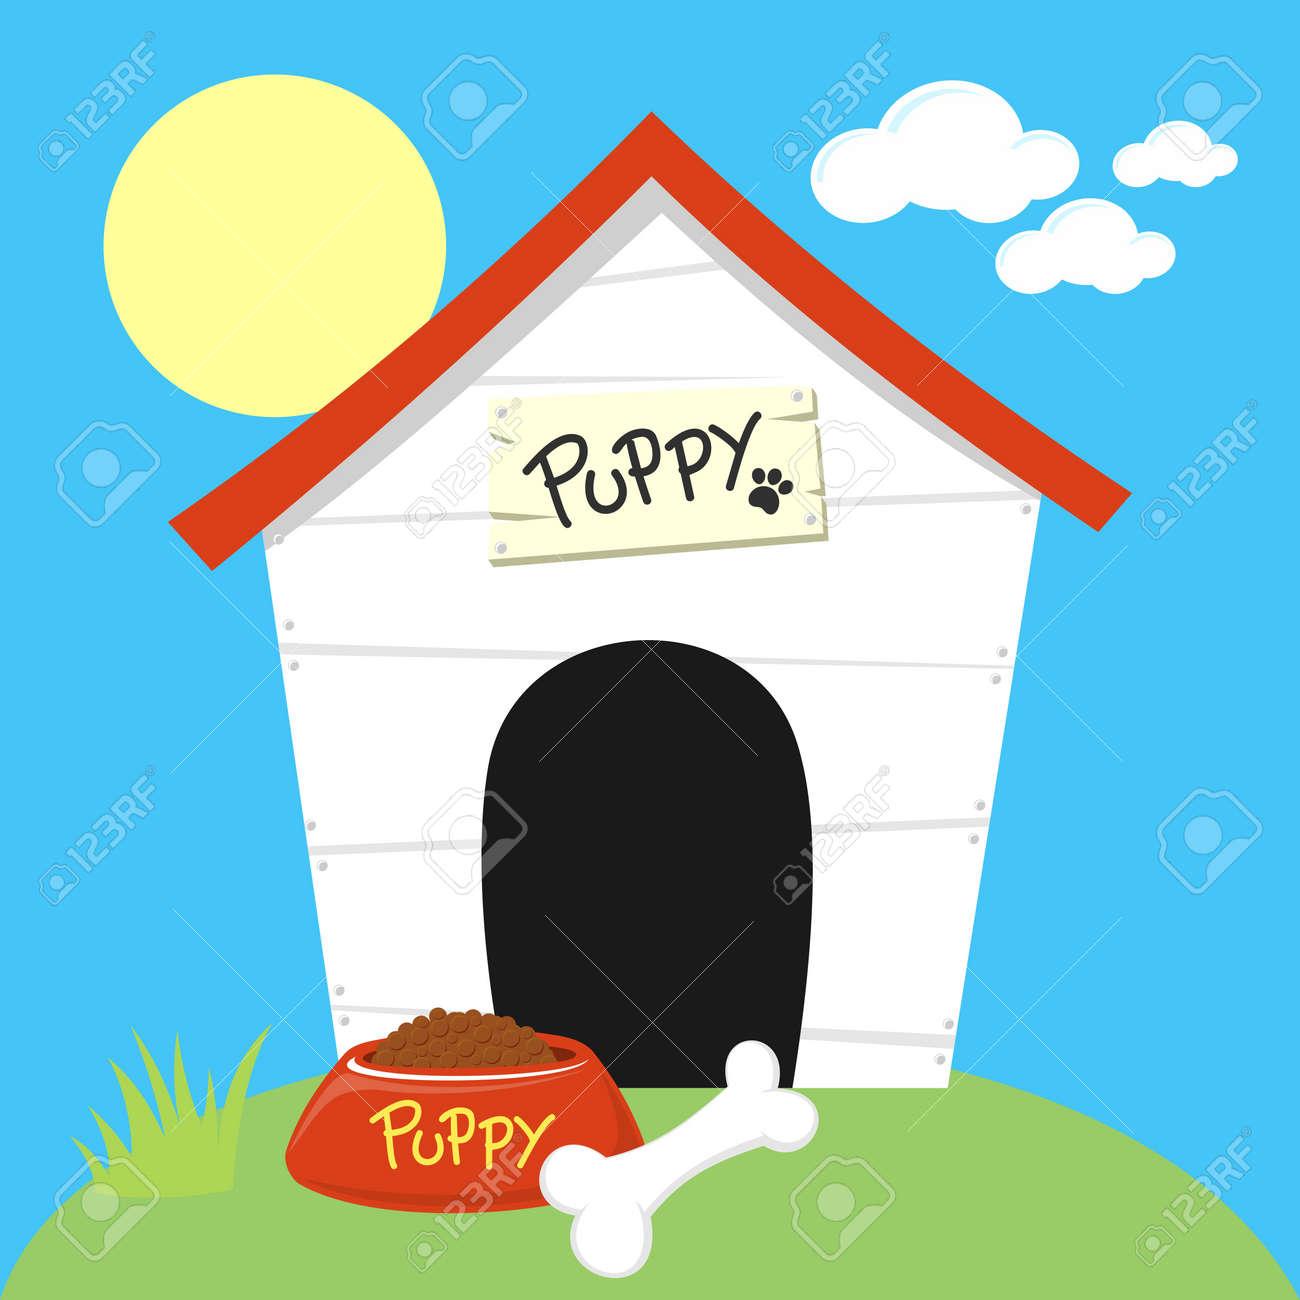 cute dog house with dog food bowl and bone royalty free cliparts rh 123rf com dog house clip art free dog house clip art free